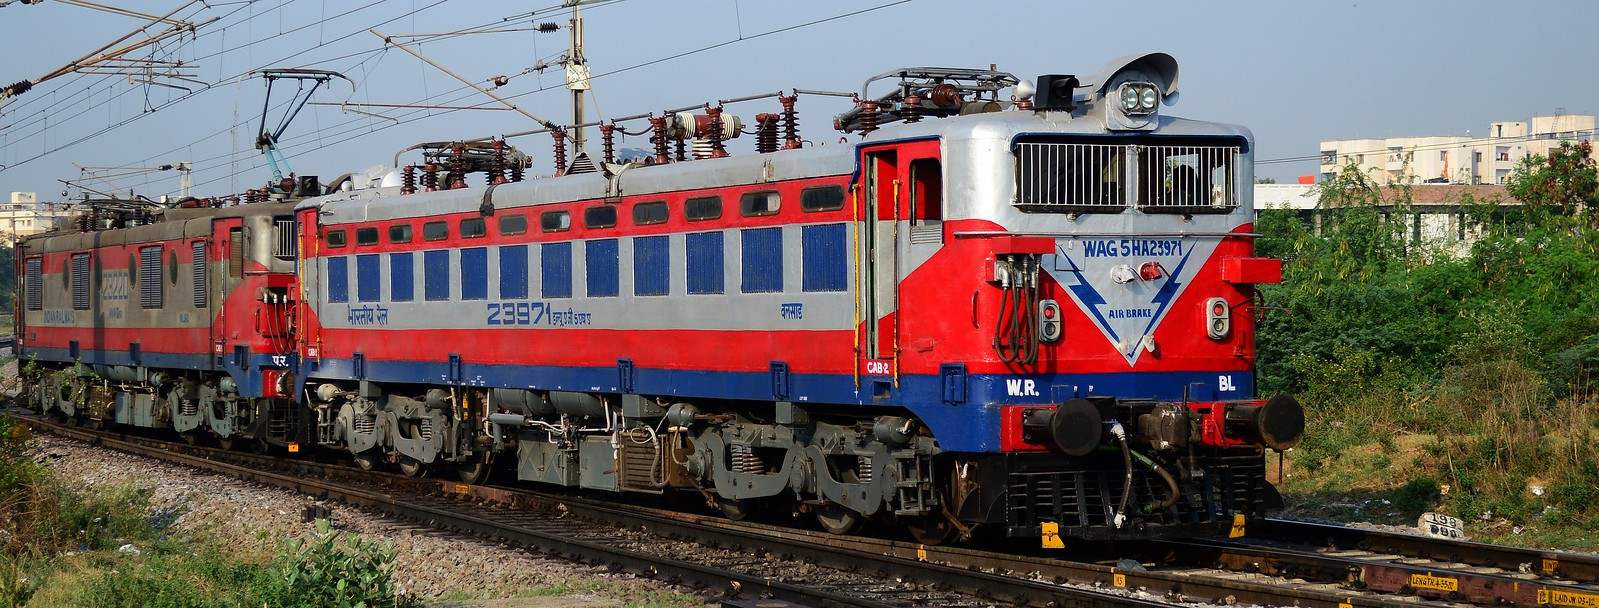 Twin Valsad WAG5 locos